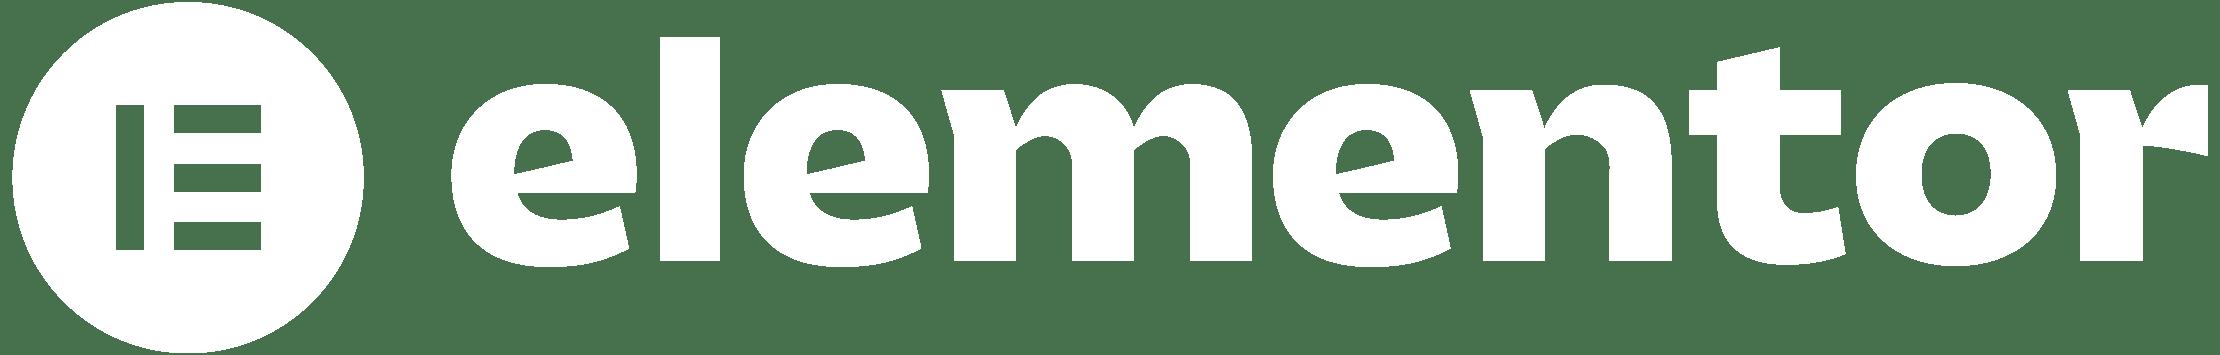 Elementor page builder logo in white